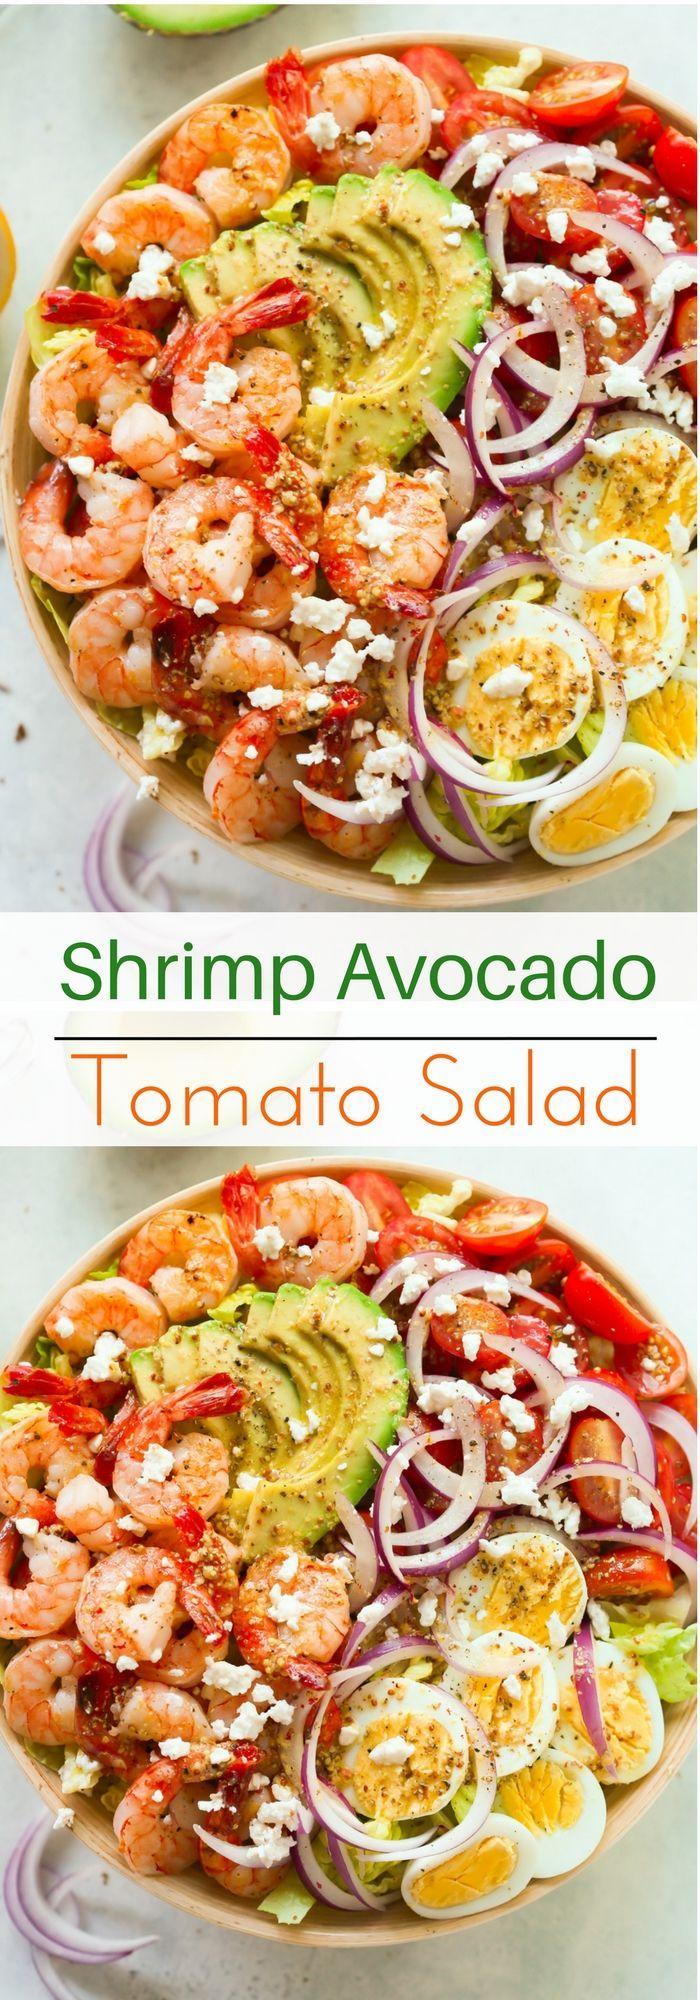 Shrimp Avocado Tomato Salad – Brenda Dauncey